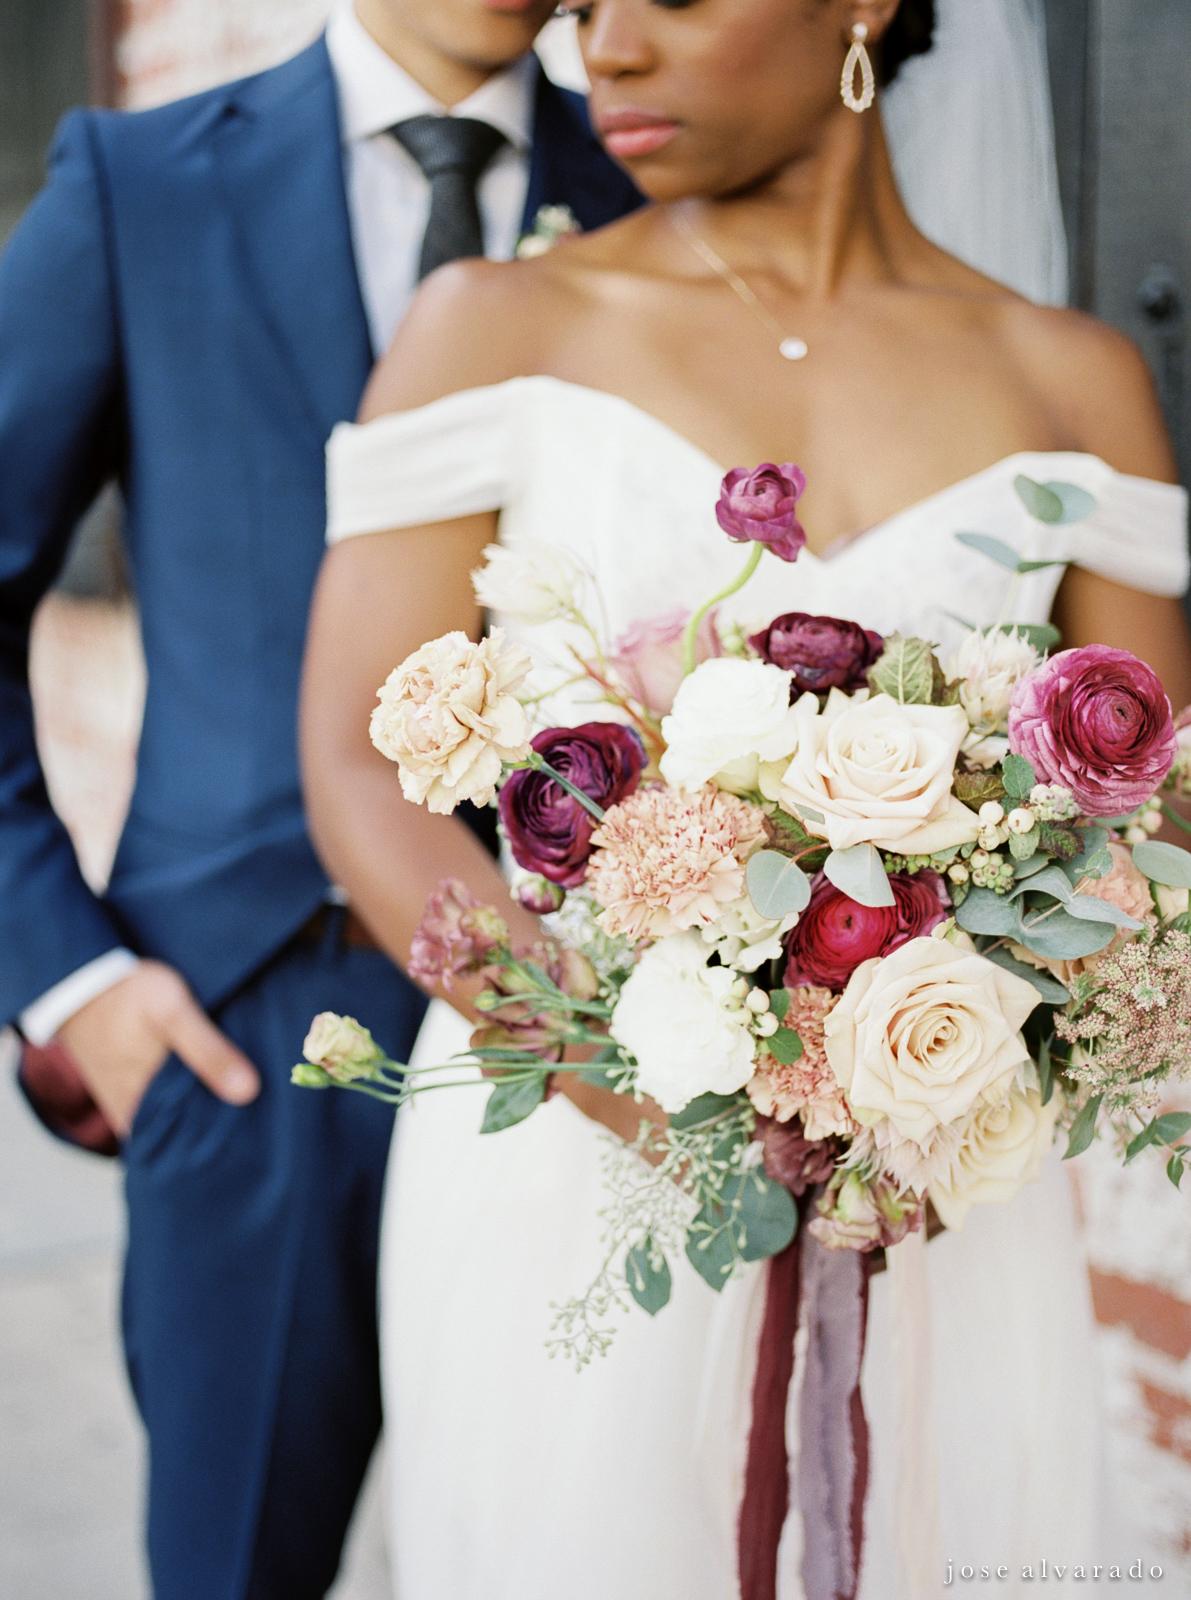 the-carondalet-house-wedding-los-angeles-ca-19   Jose Alvarado